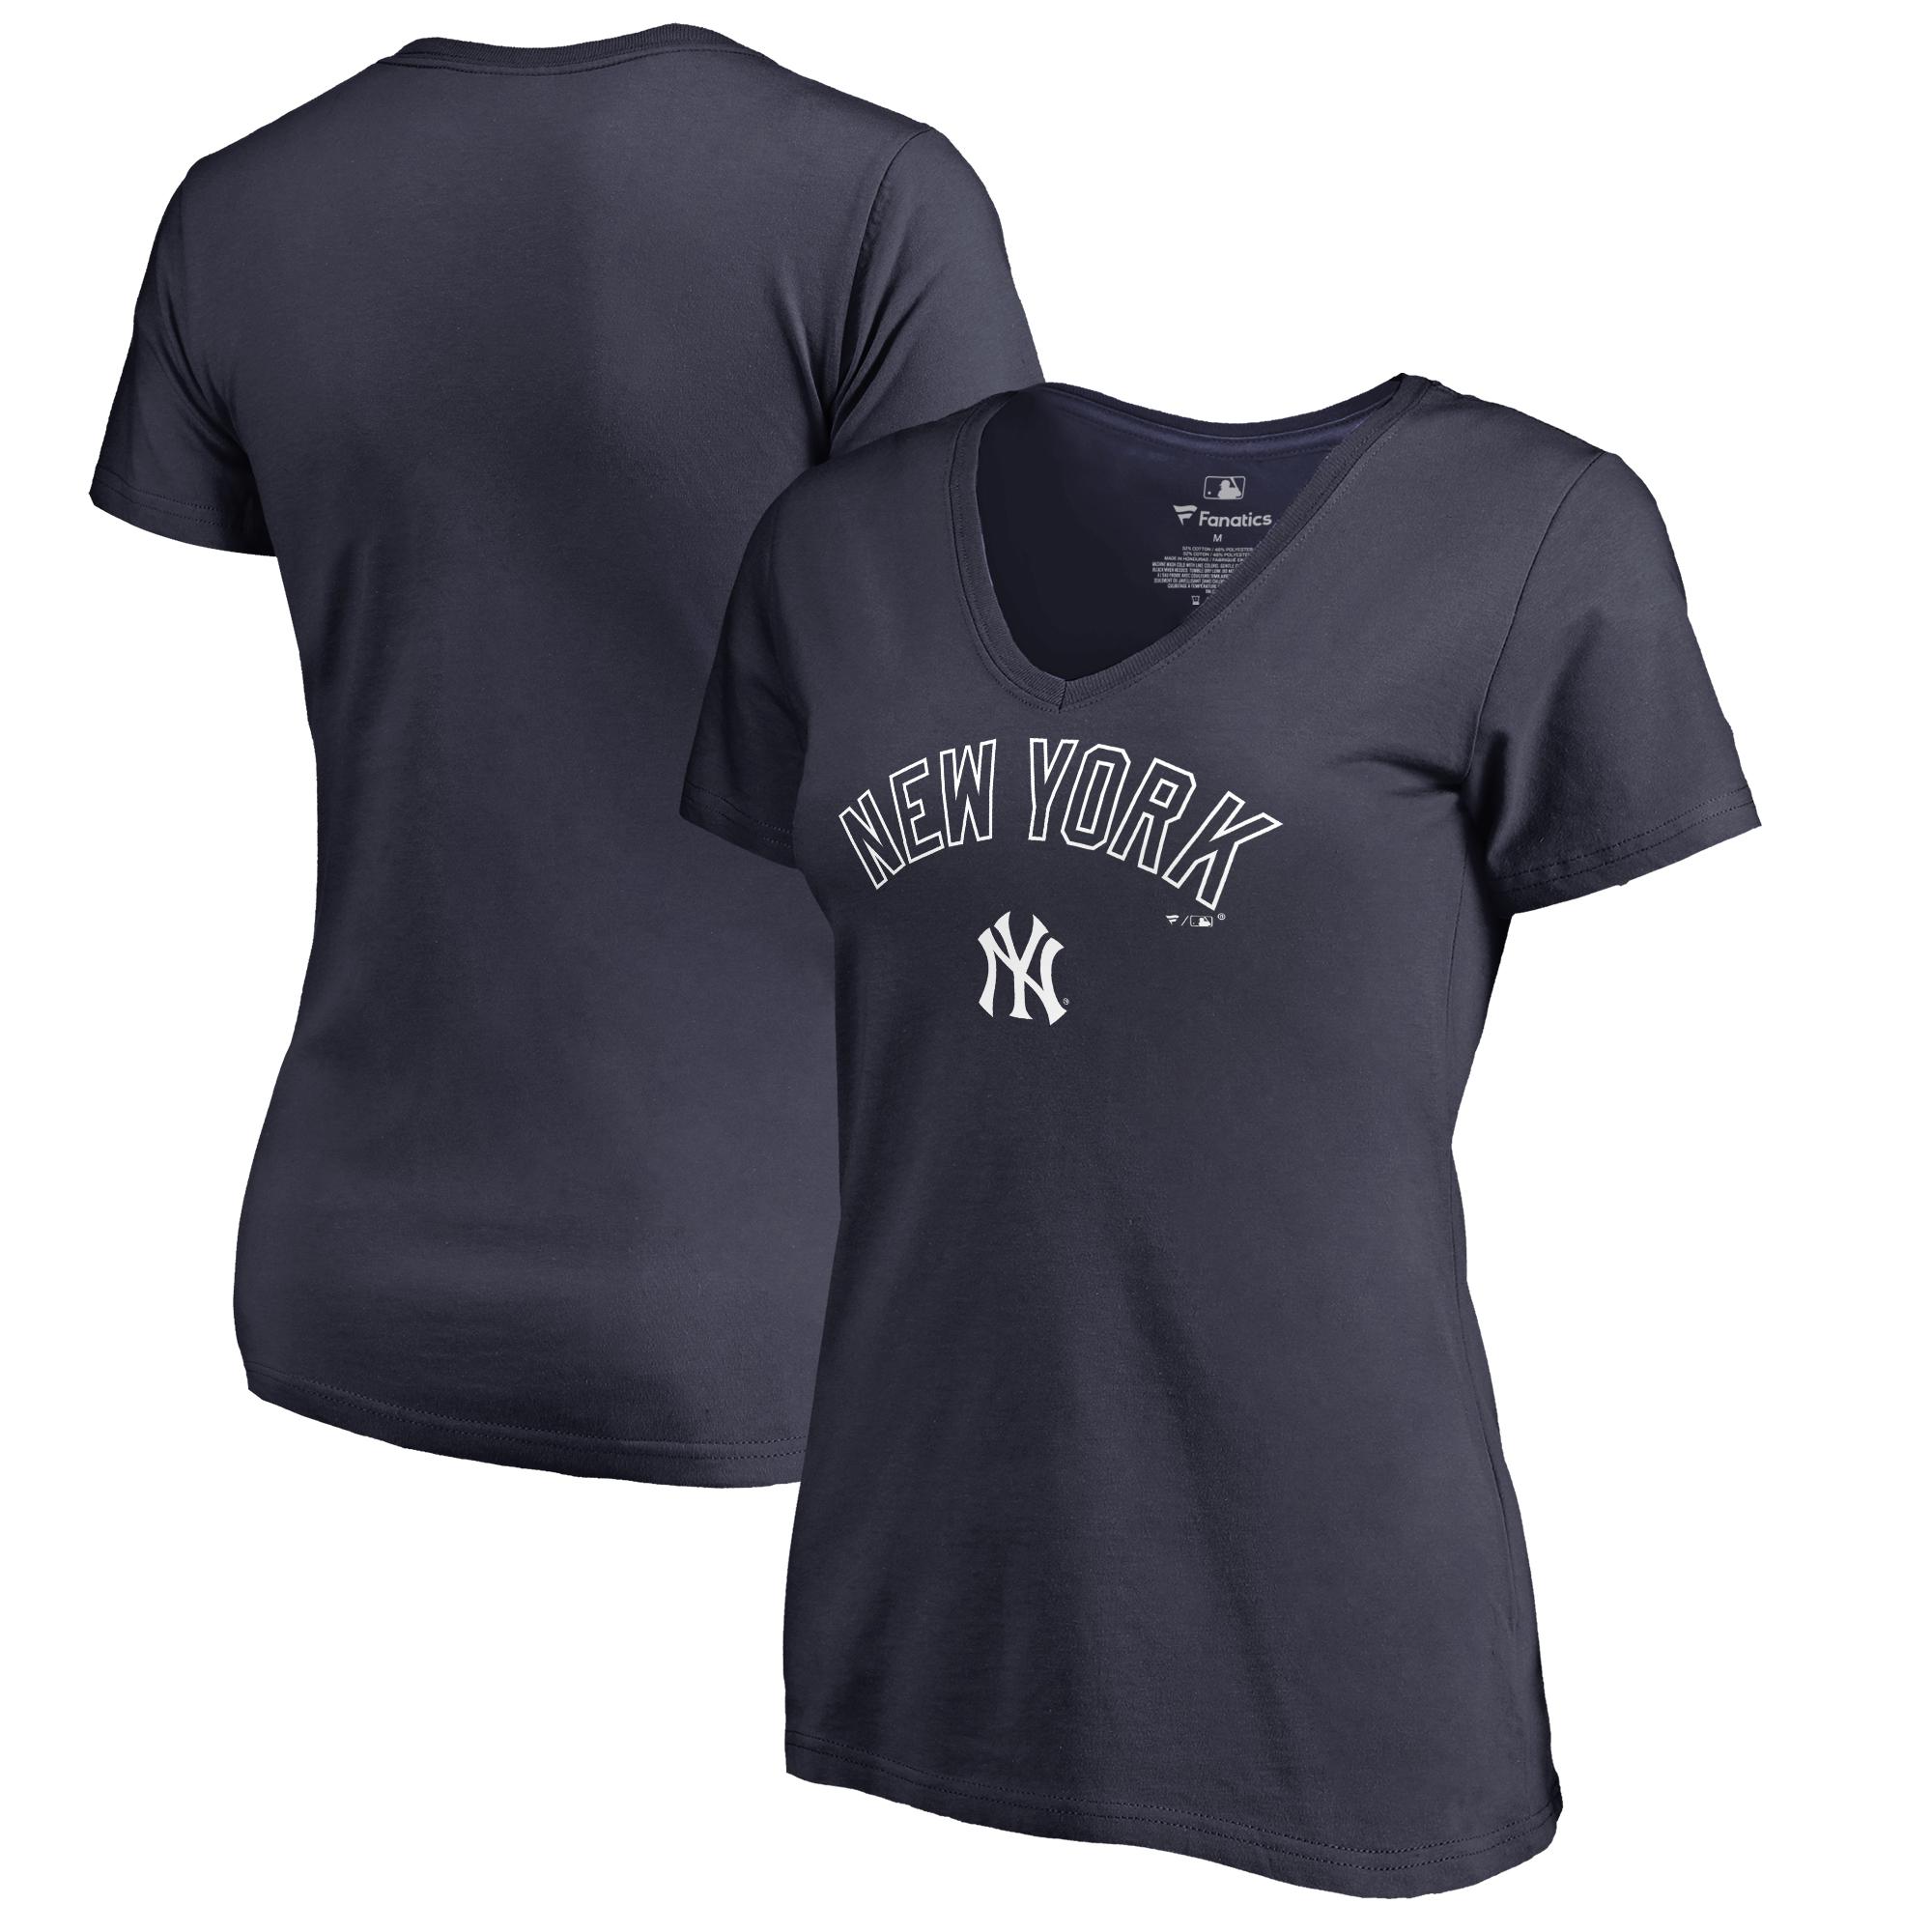 New York Yankees Fanatics Branded Women's Plus Sizes Team Lockup T-Shirt - Navy